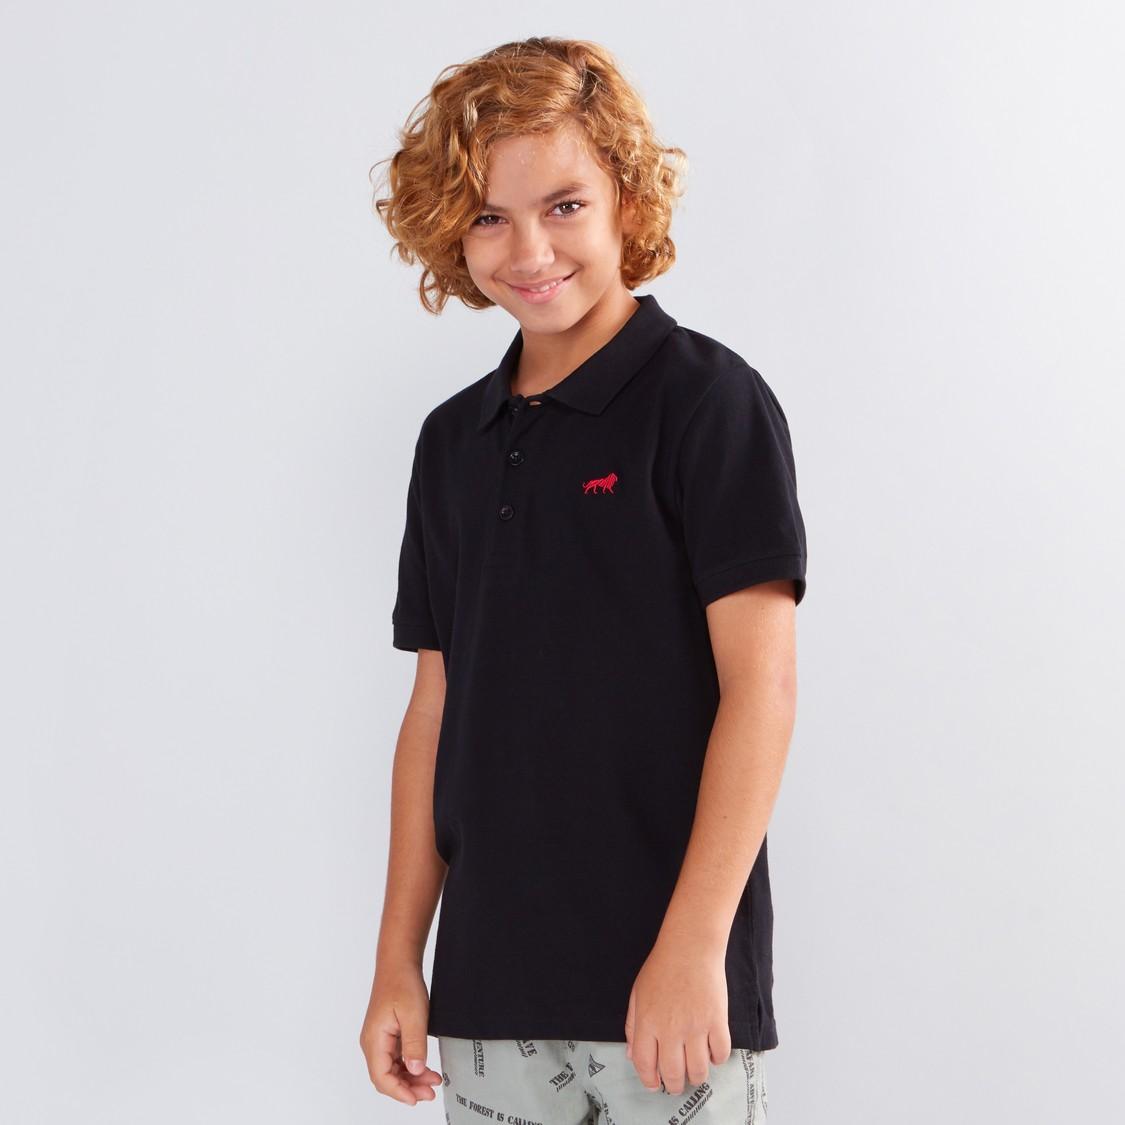 Polo Neck Short Sleeves T-Shirt